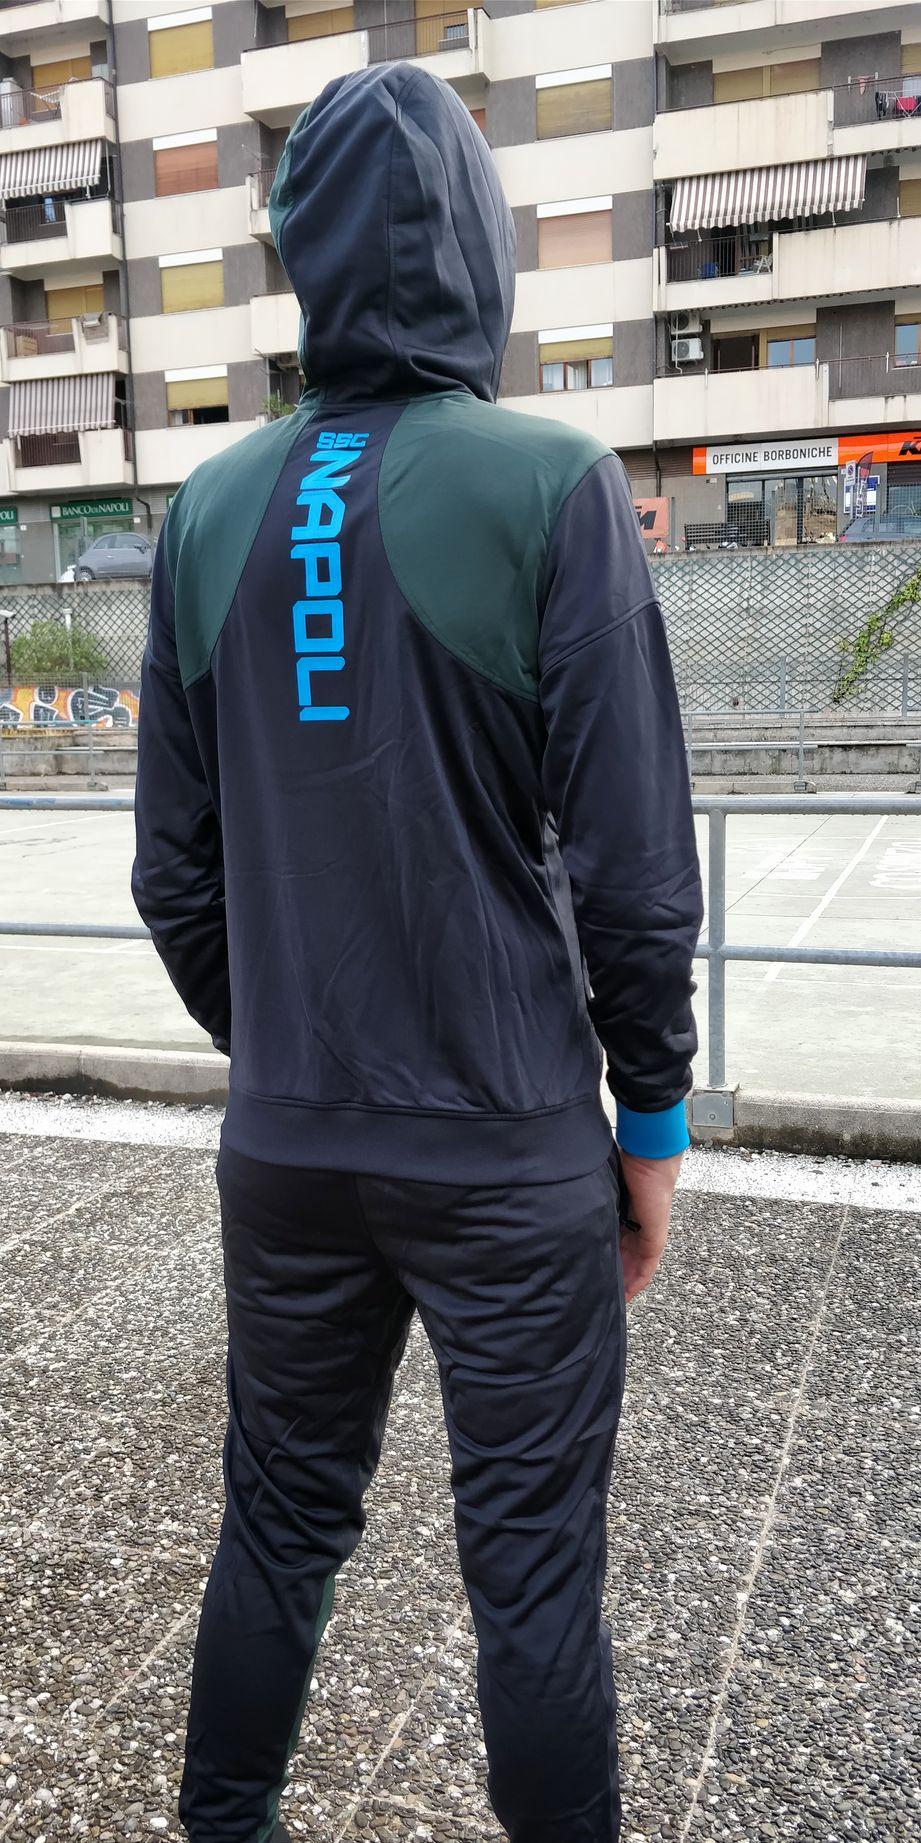 SSC Napoli Kappa Training Suit Training Tracksuit Blau 2018 19 5 5 of 7 ... 0d4266fa738ff